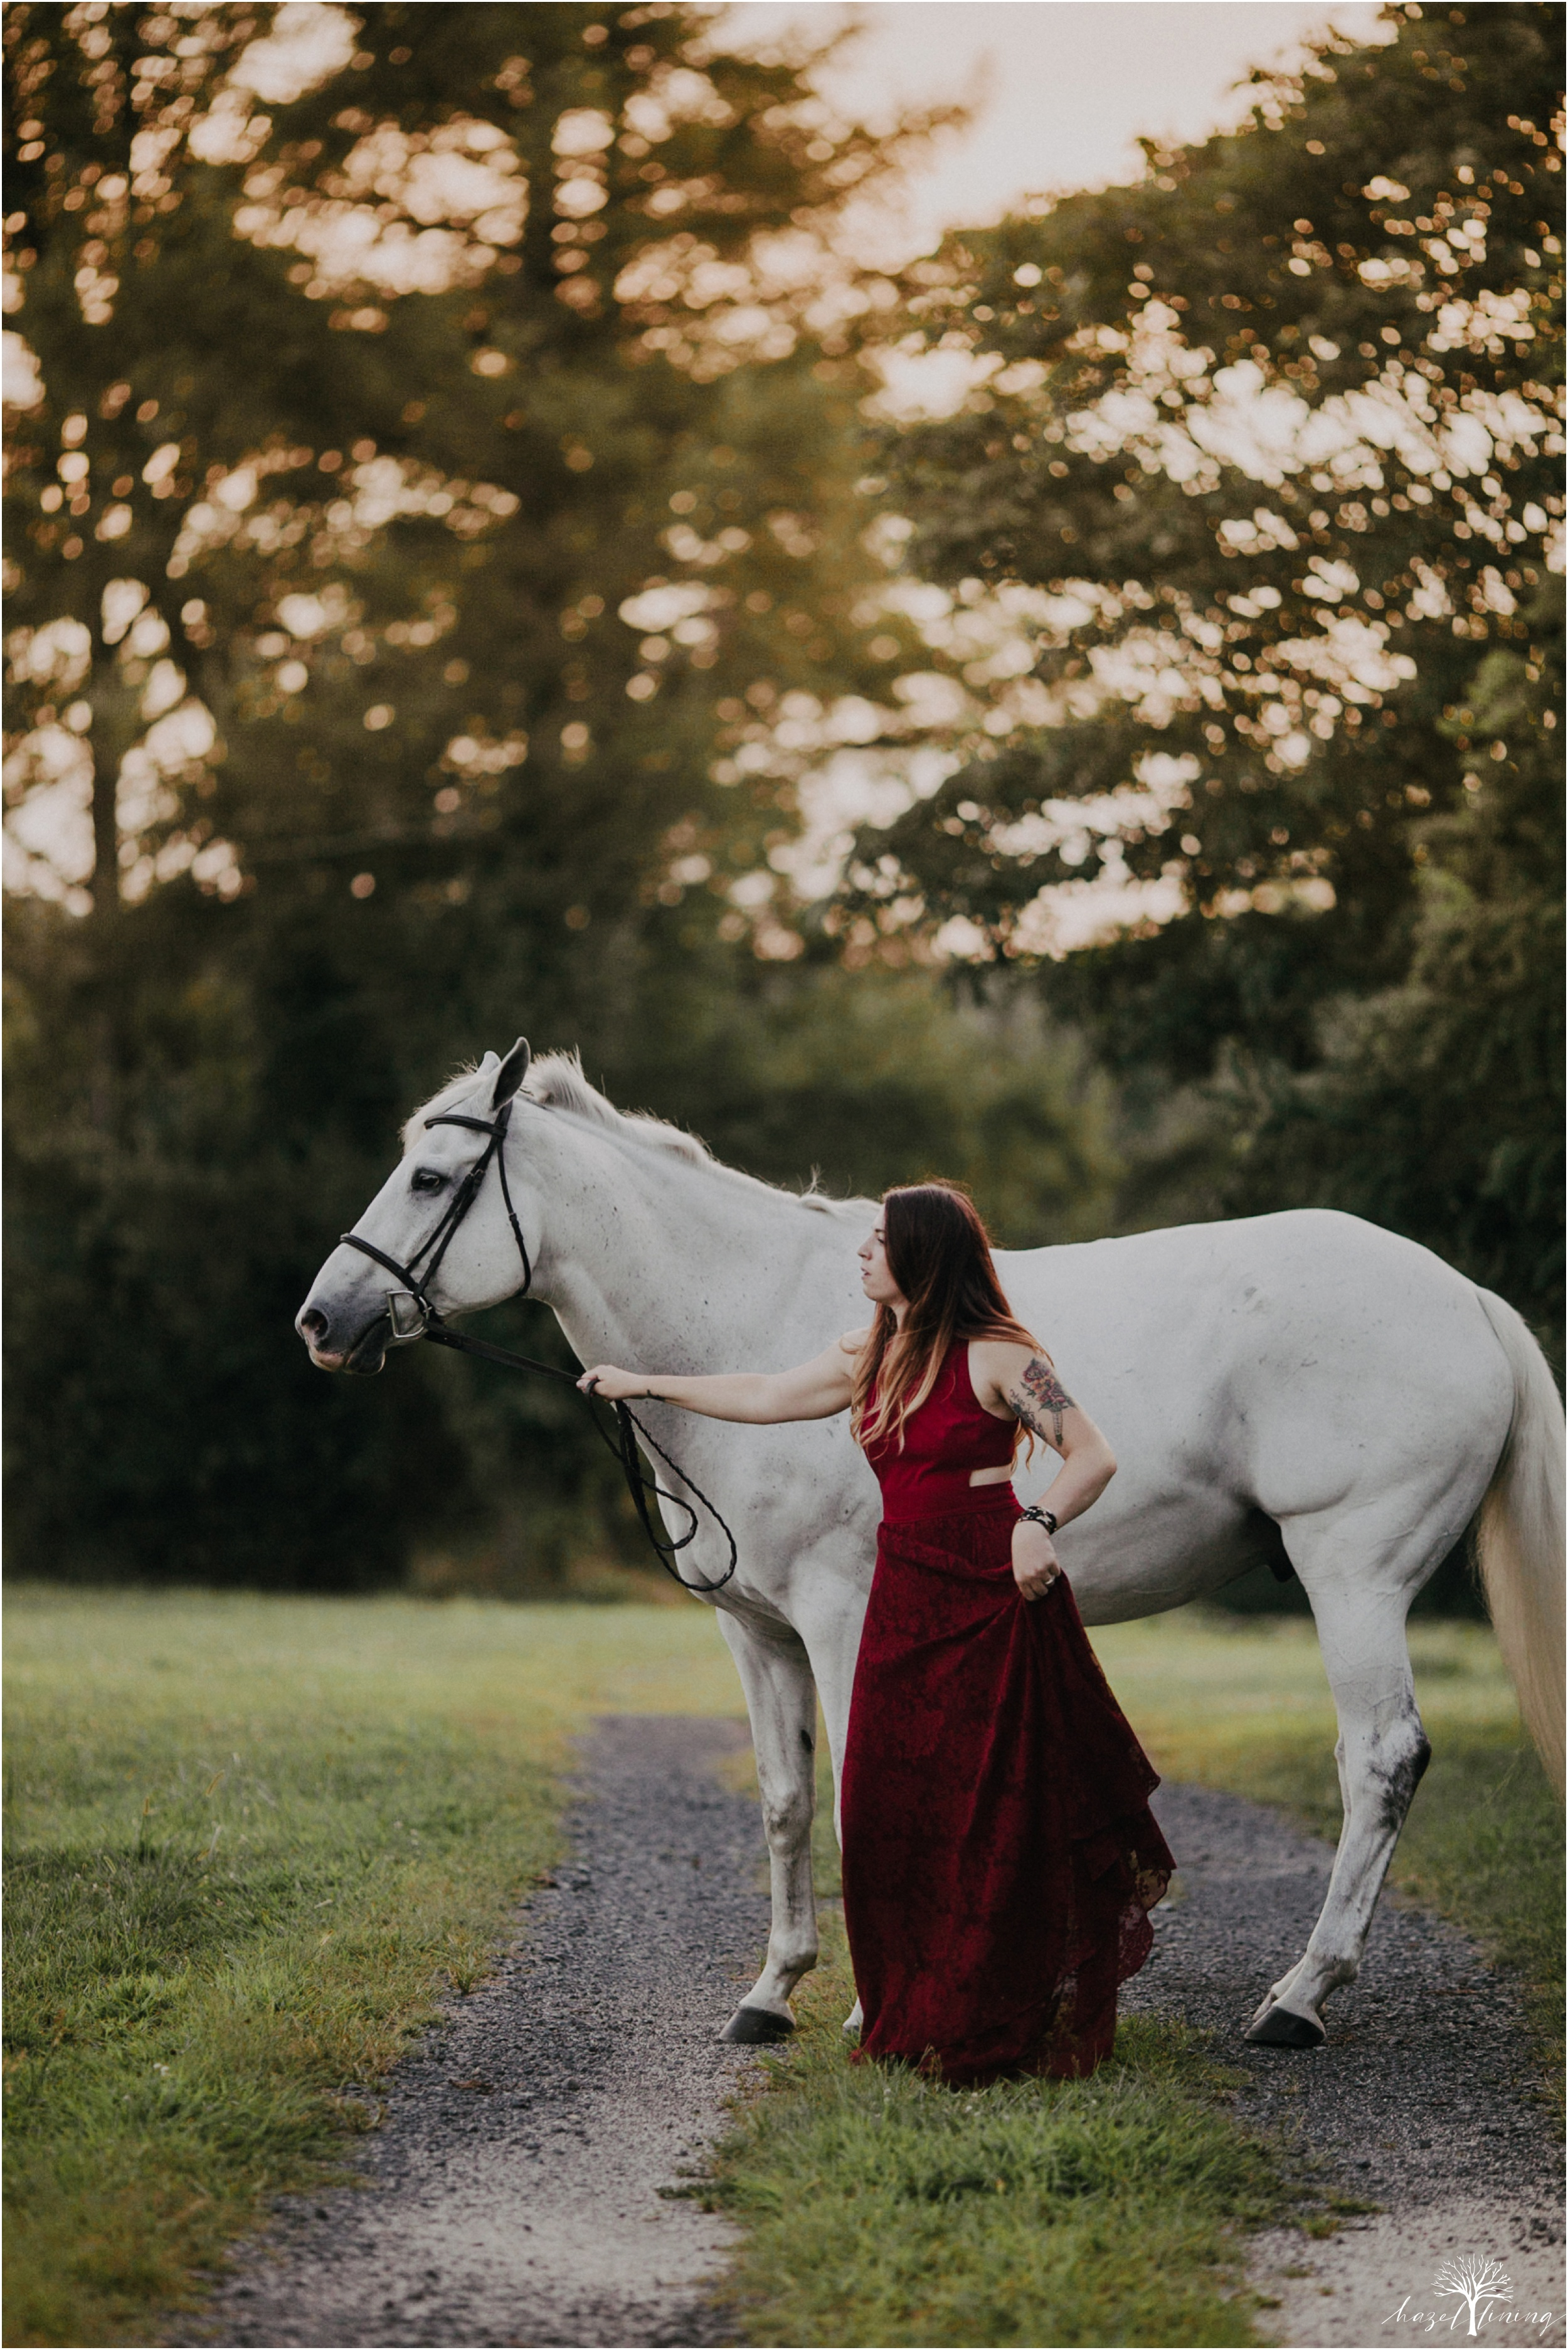 taylor-adams-and-horse-delaware-valley-university-delval-summer-equestrian-portrait-session-hazel-lining-photography-destination-elopement-wedding-engagement-photography_0059.jpg